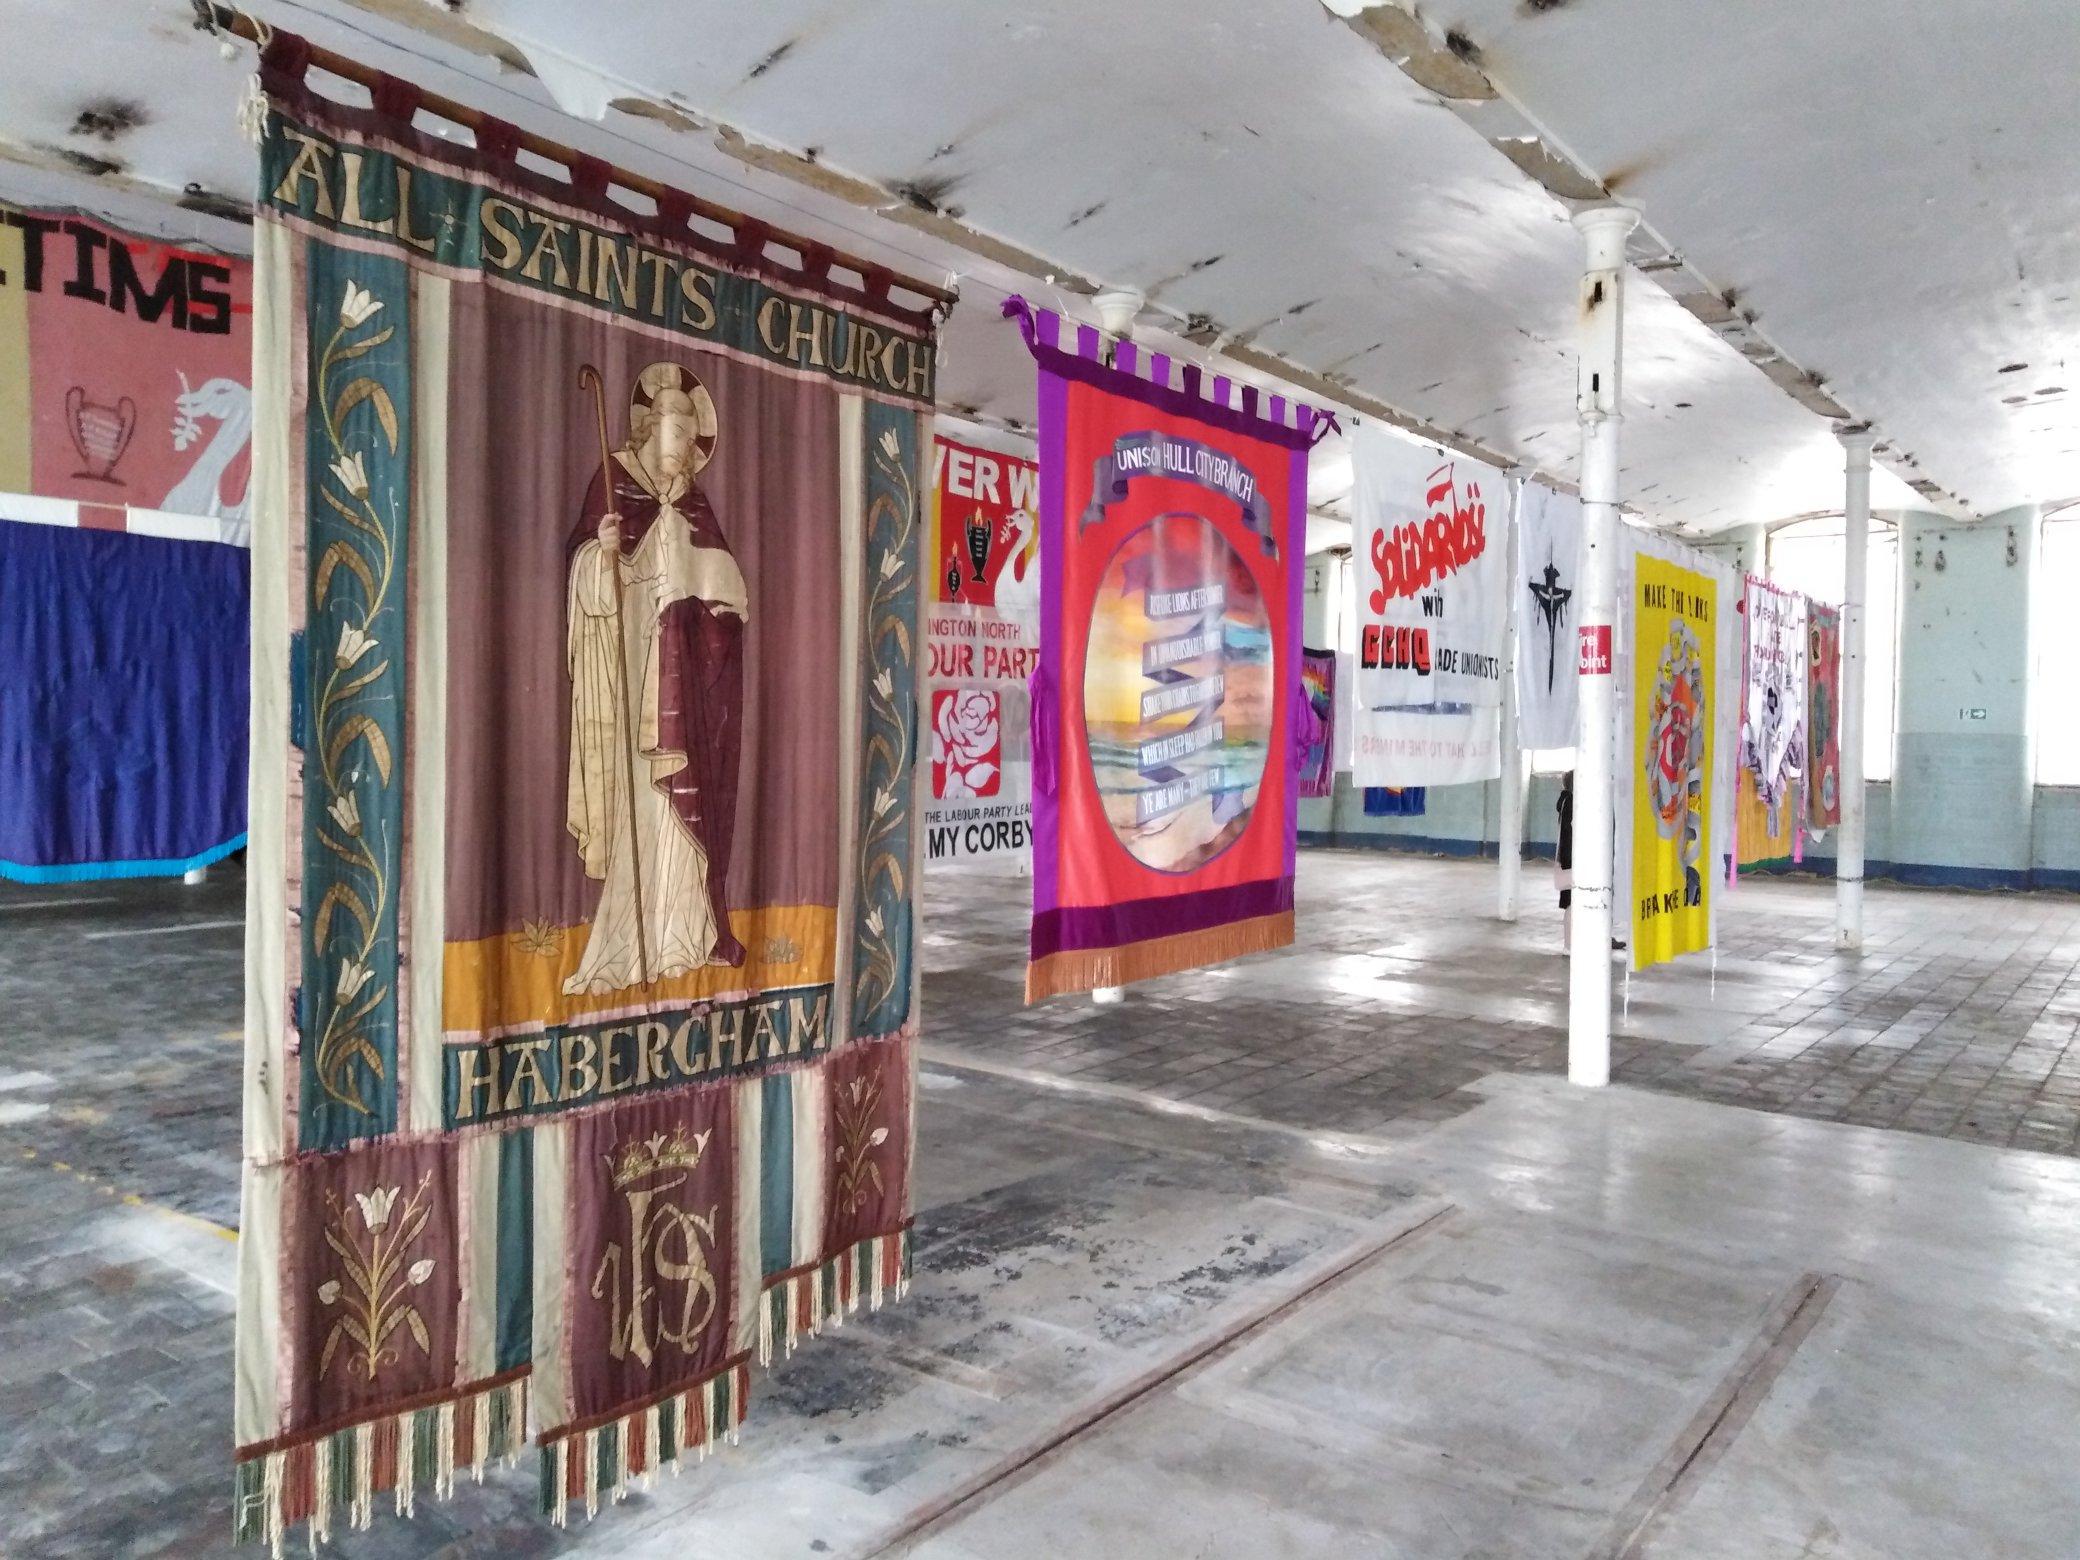 All Saints Habergham banner (3)